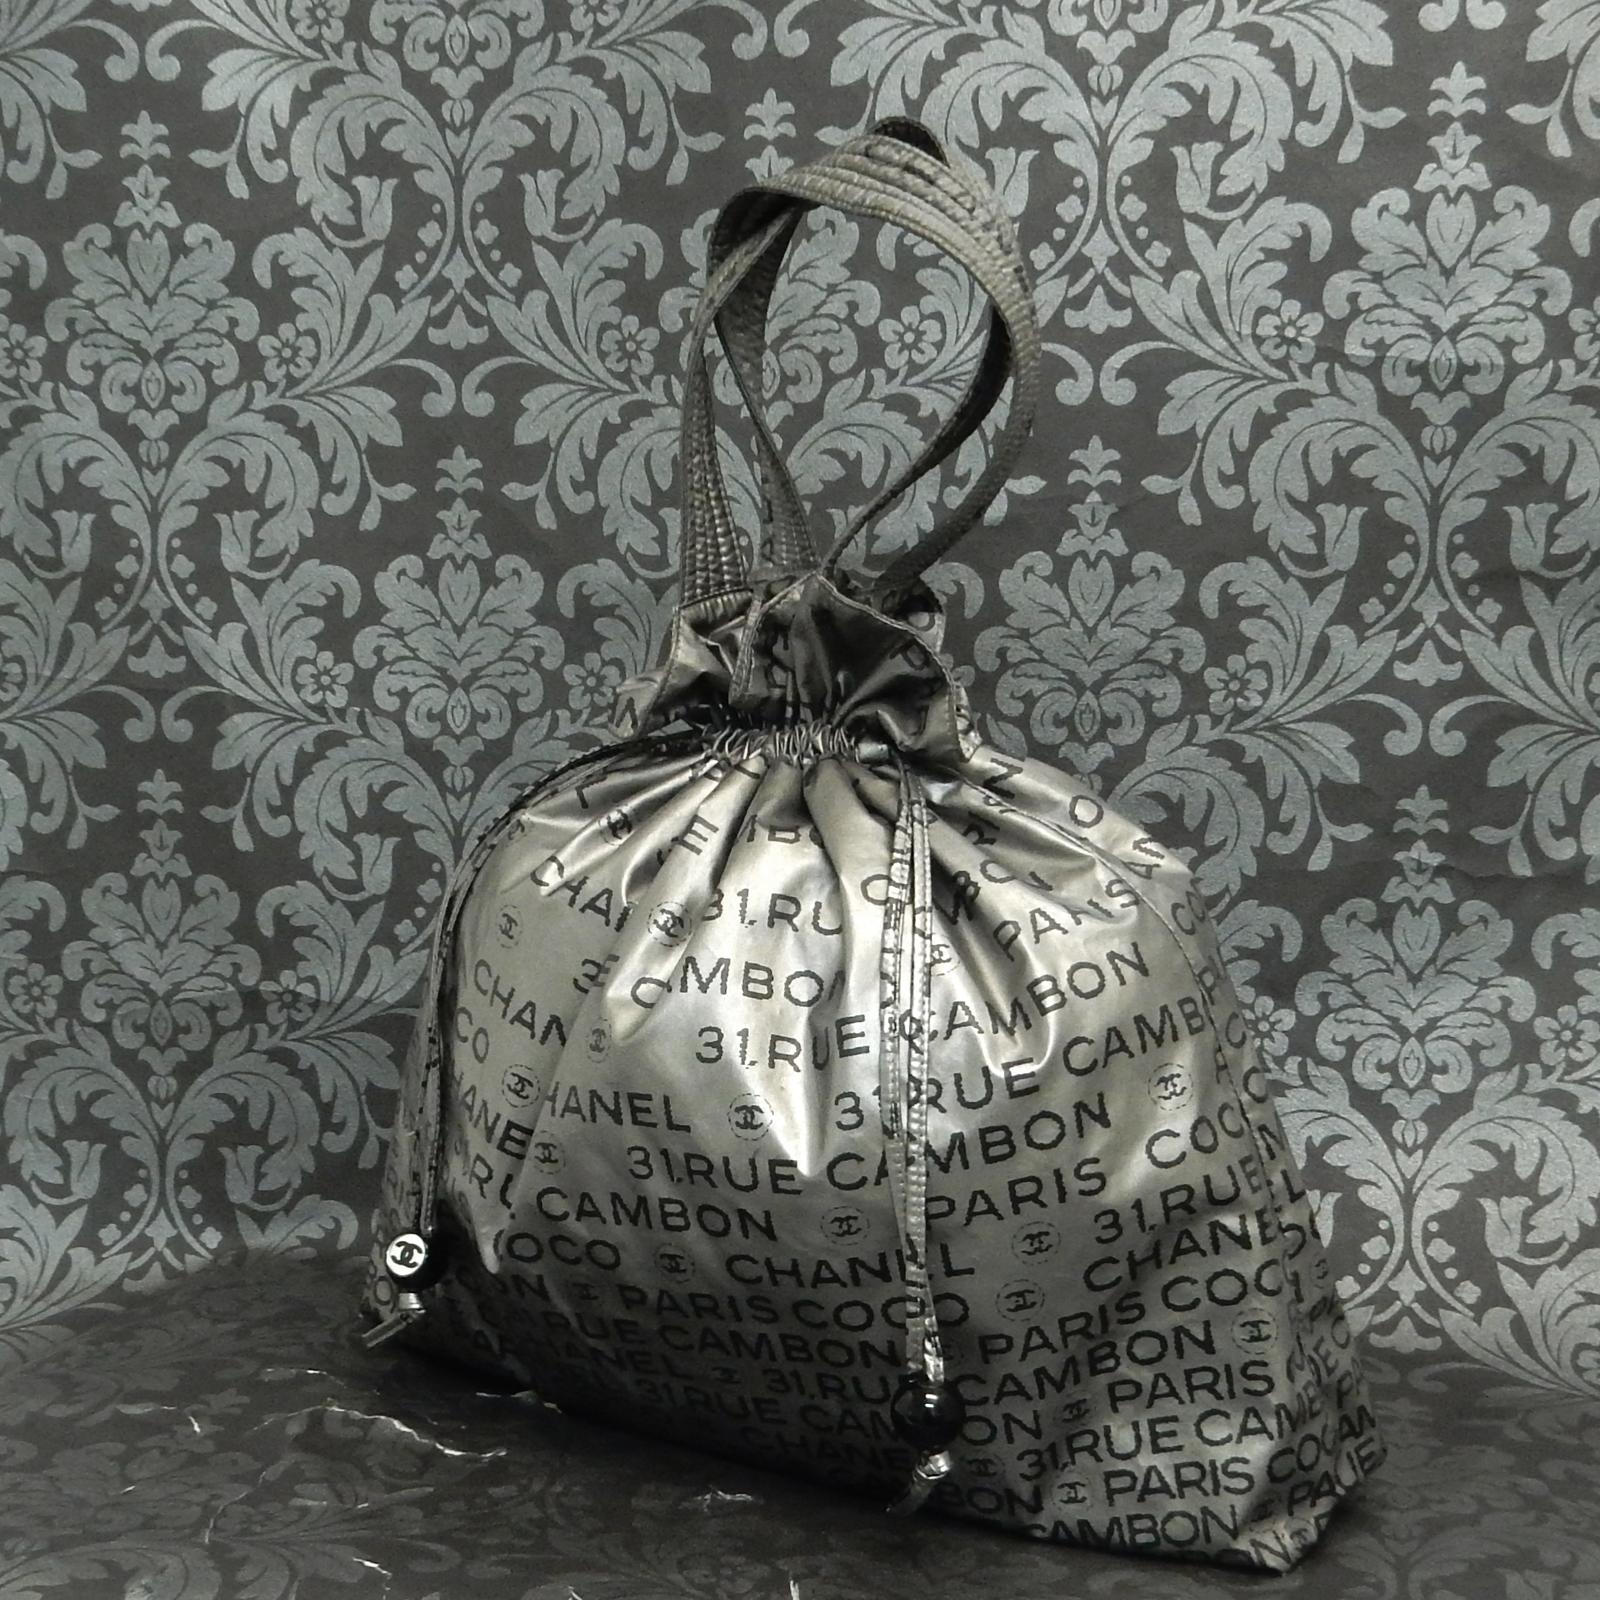 60e9e735d860 Details about Rise-on CHANEL Unlimited Nylon Silver DRAWSTRING Tote bag  Shoulder Bag  2007